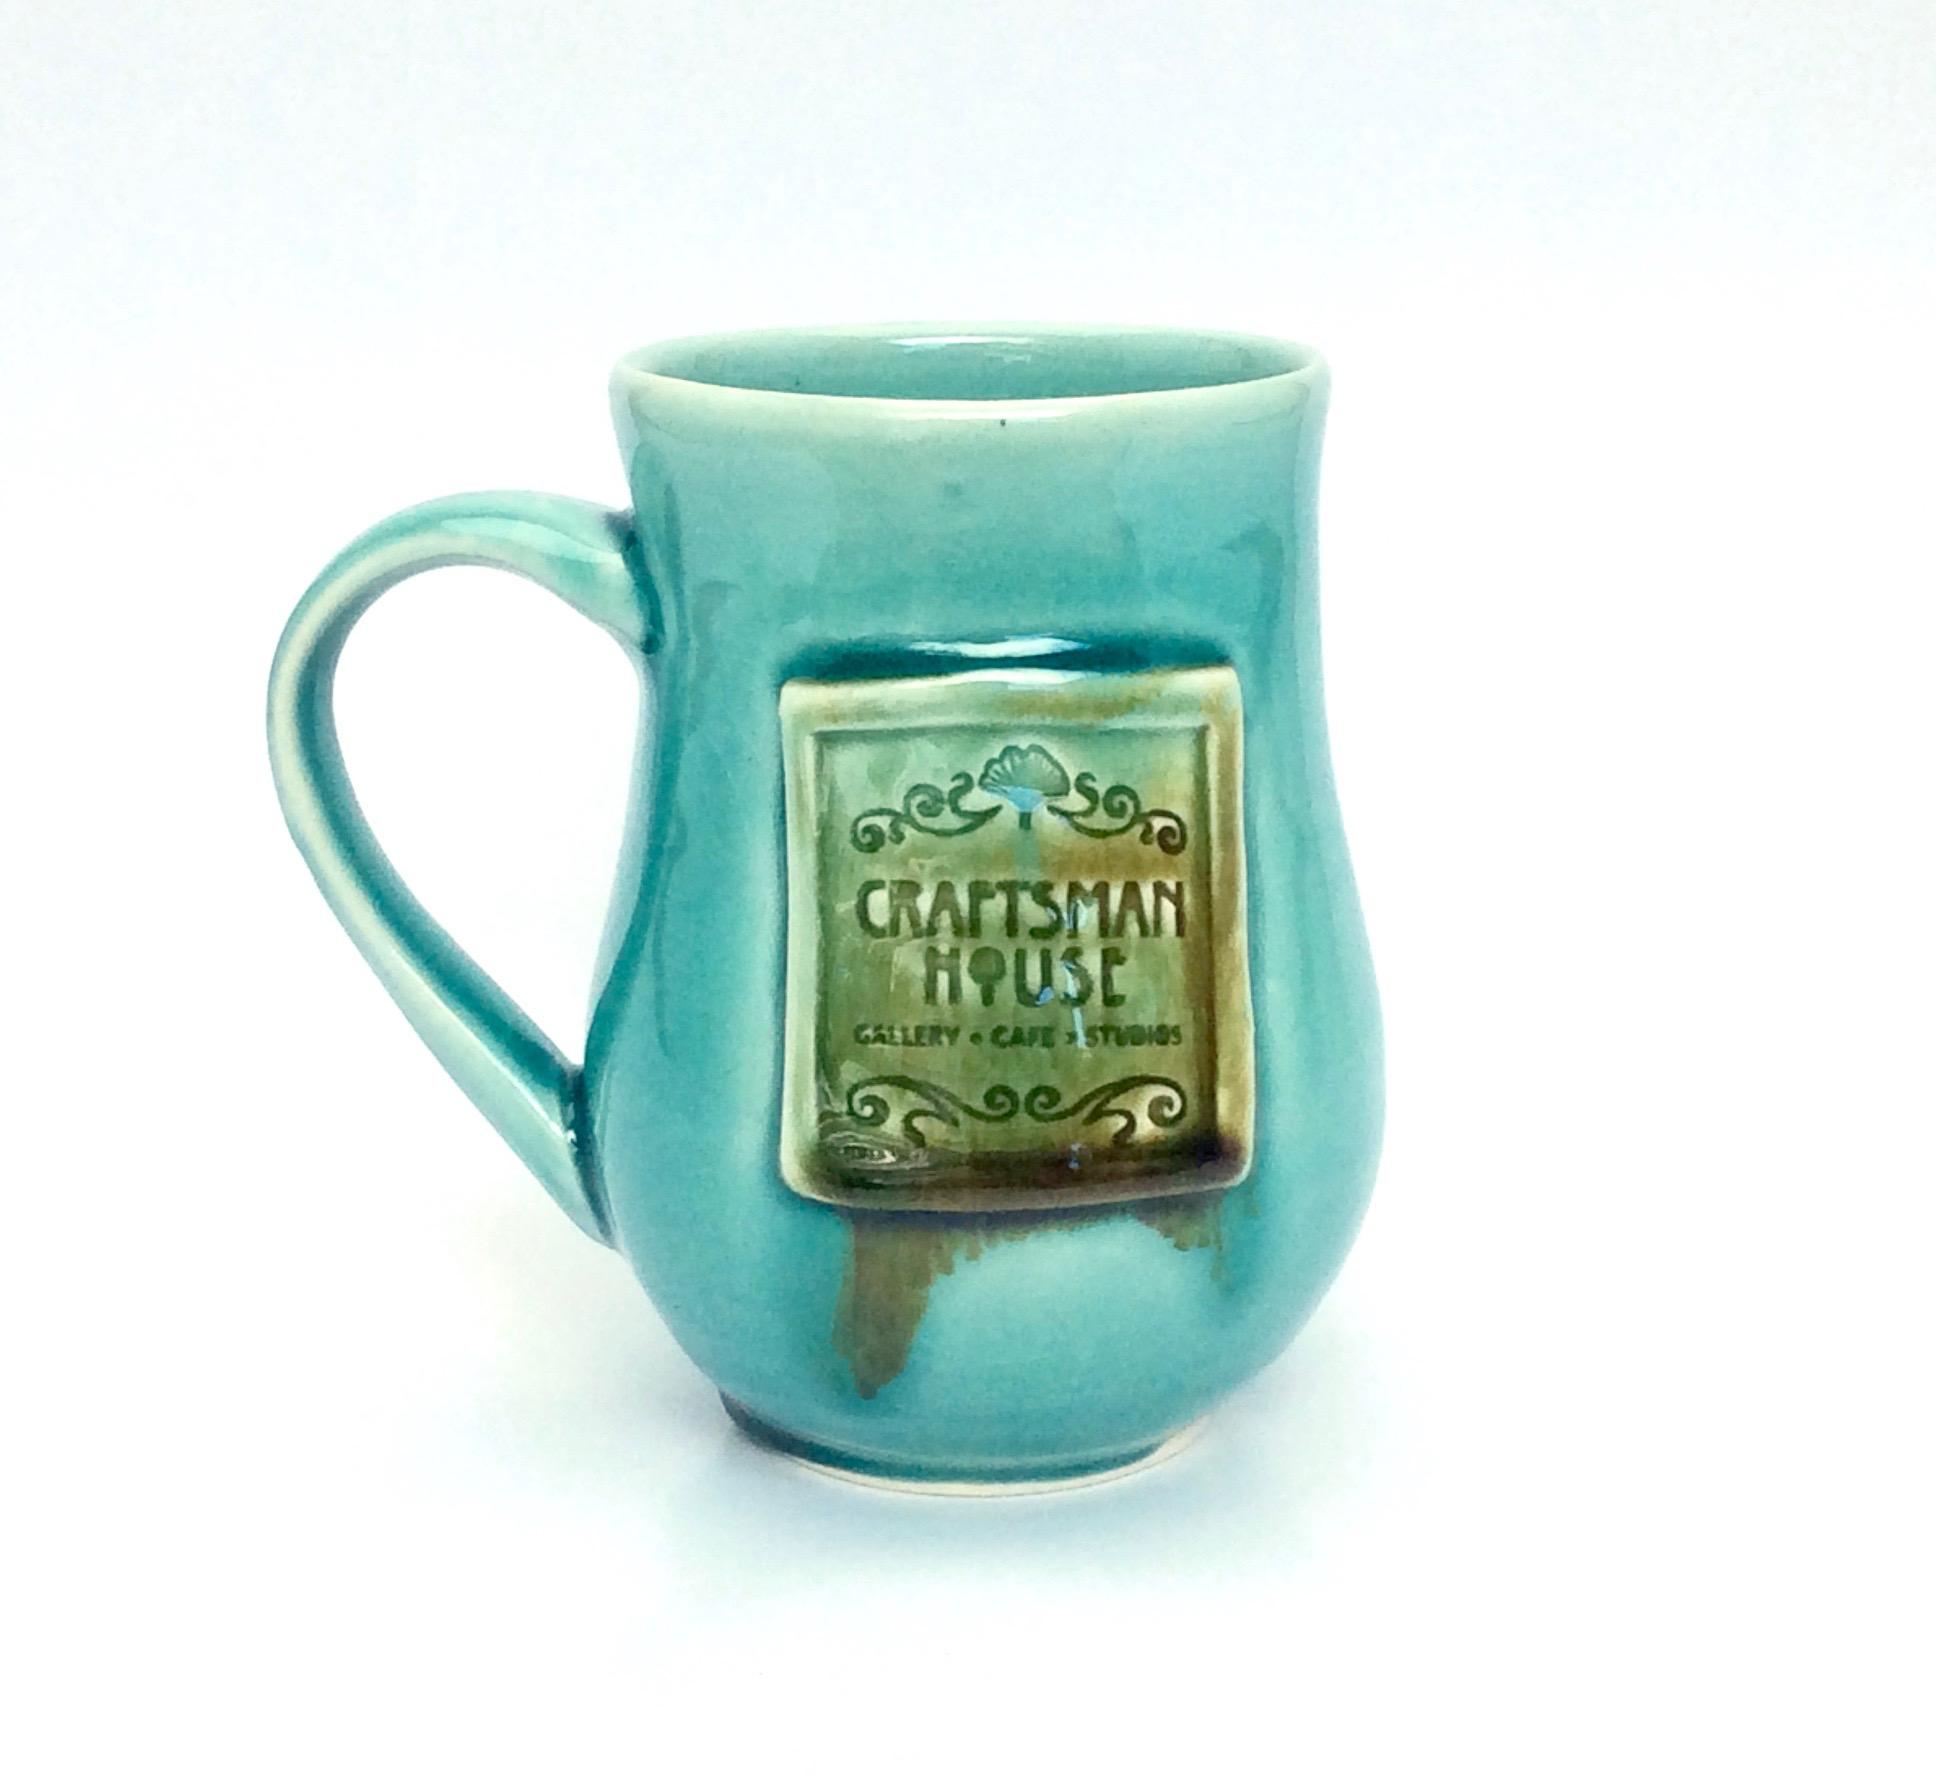 Craftsman House Mug